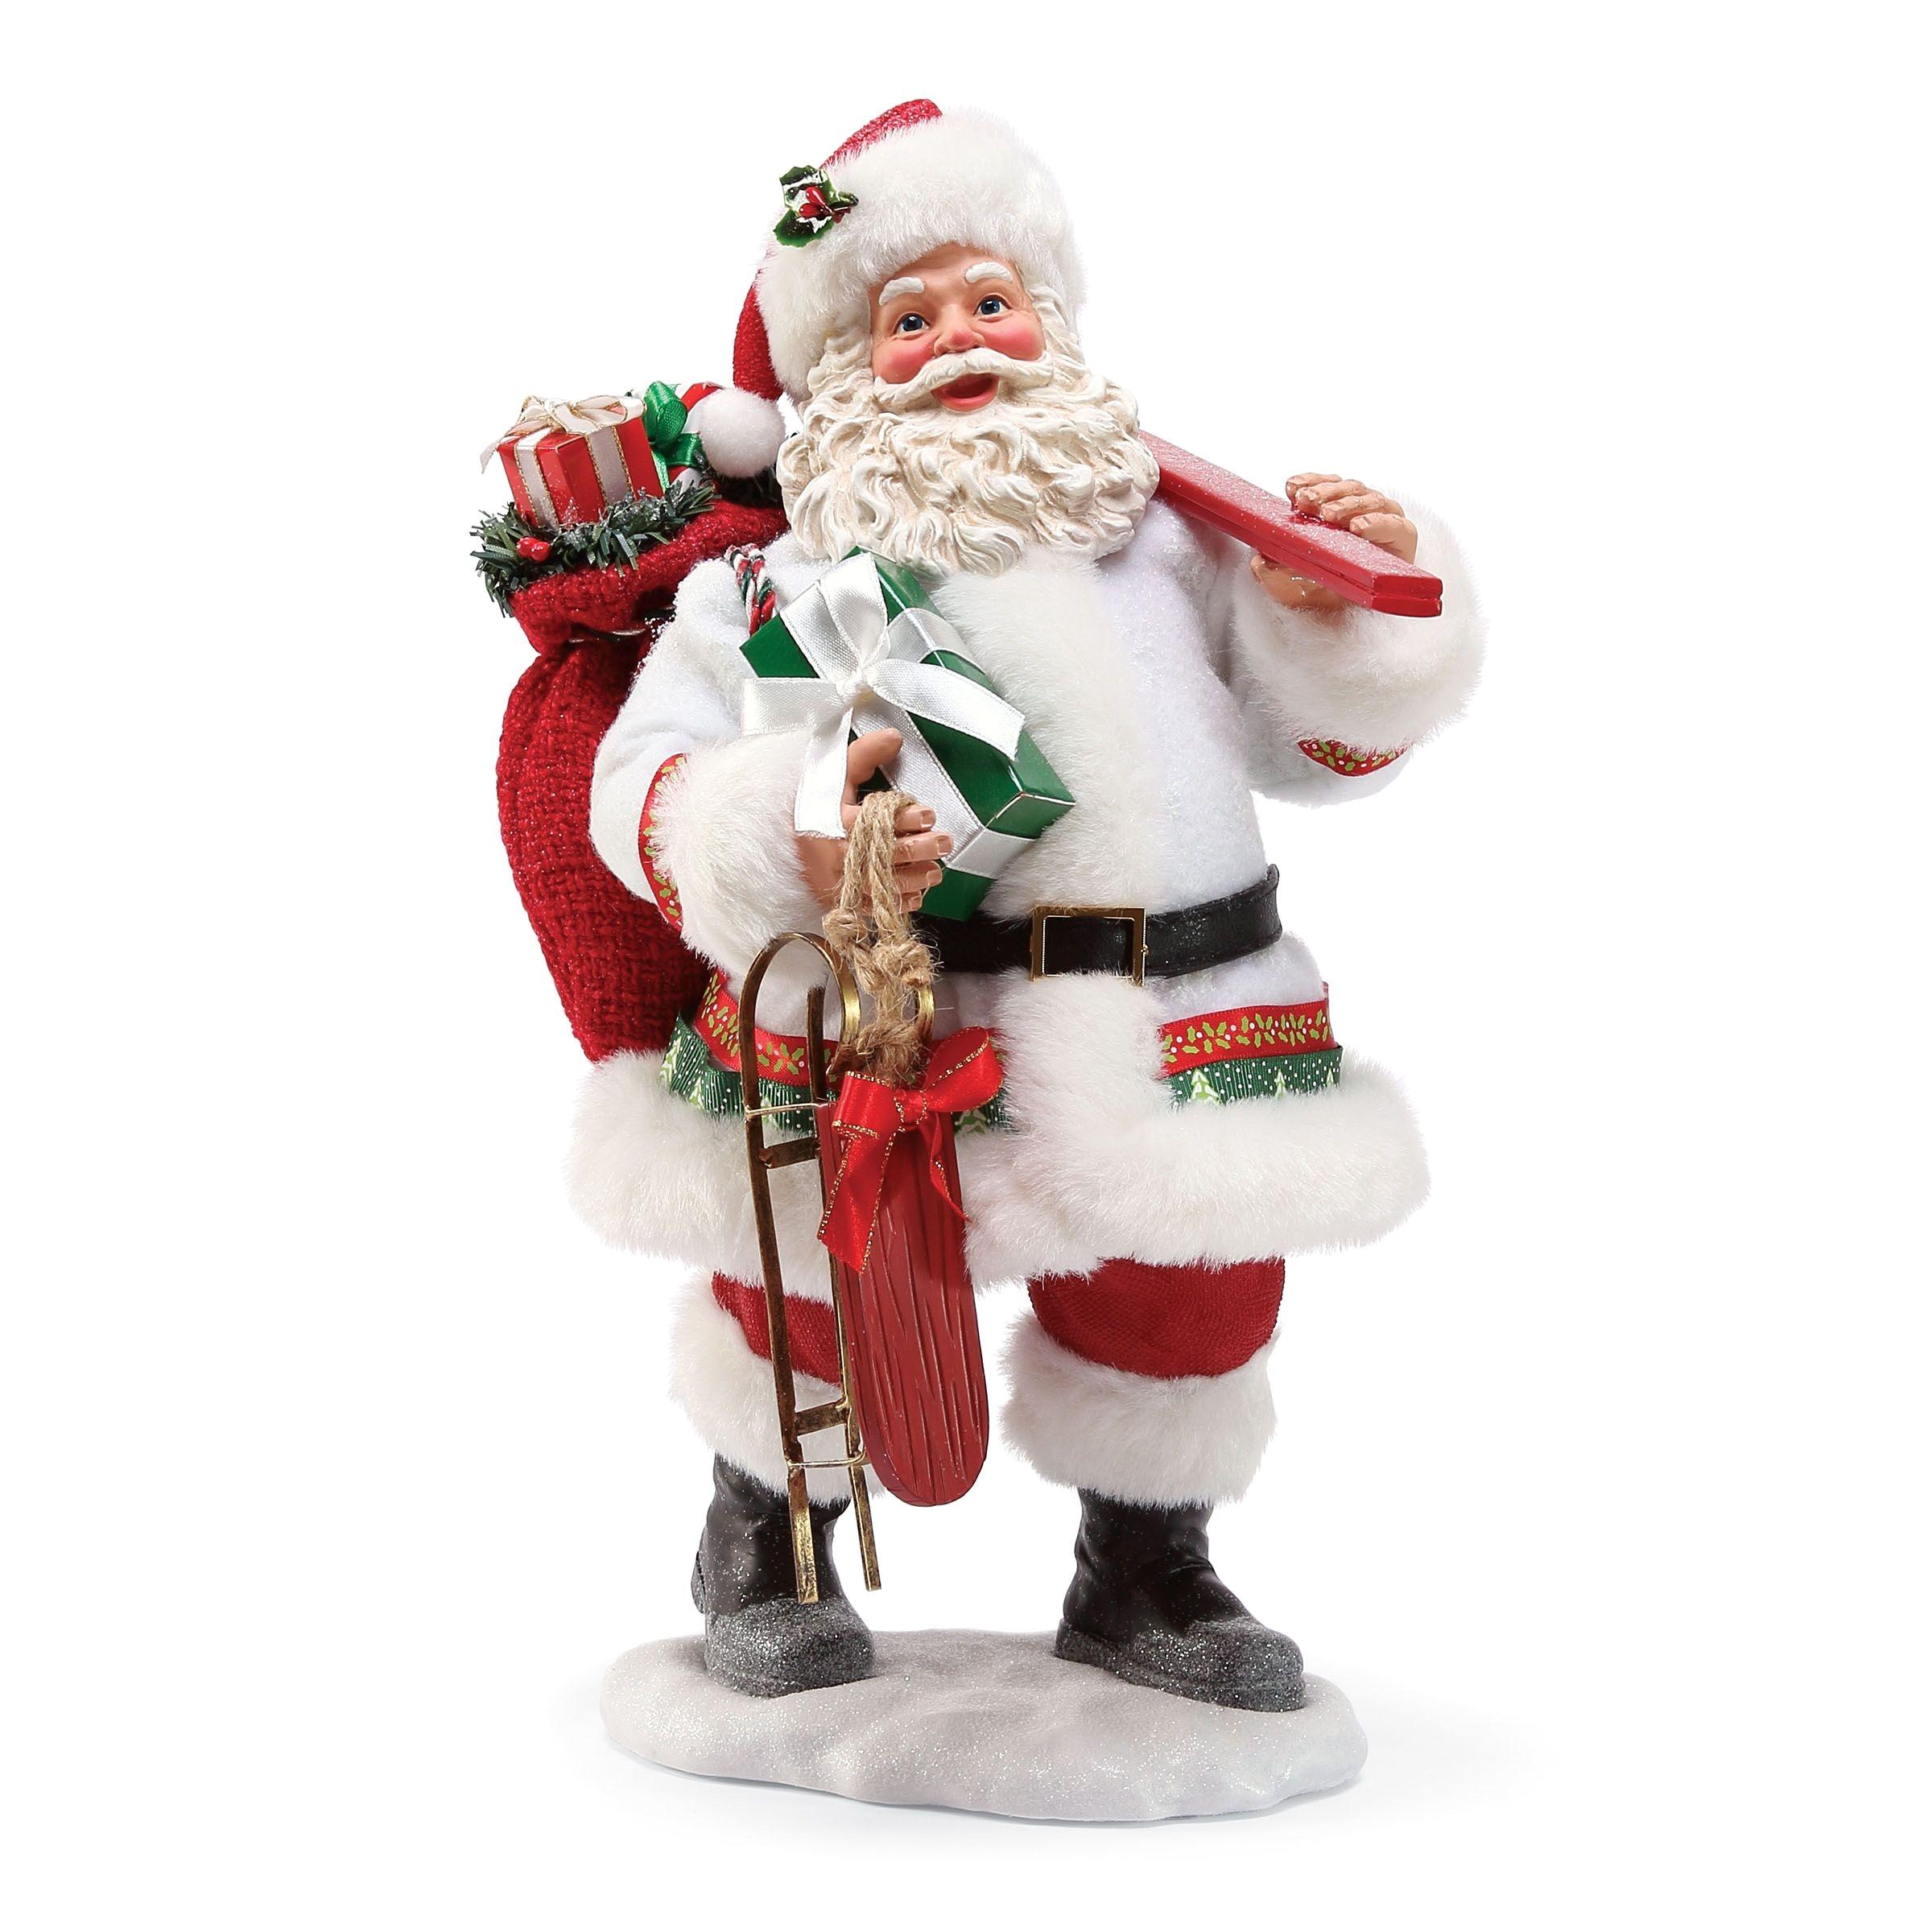 Decorative Santas Snow toys Santa Possible Dreams Pinterest Snow toys